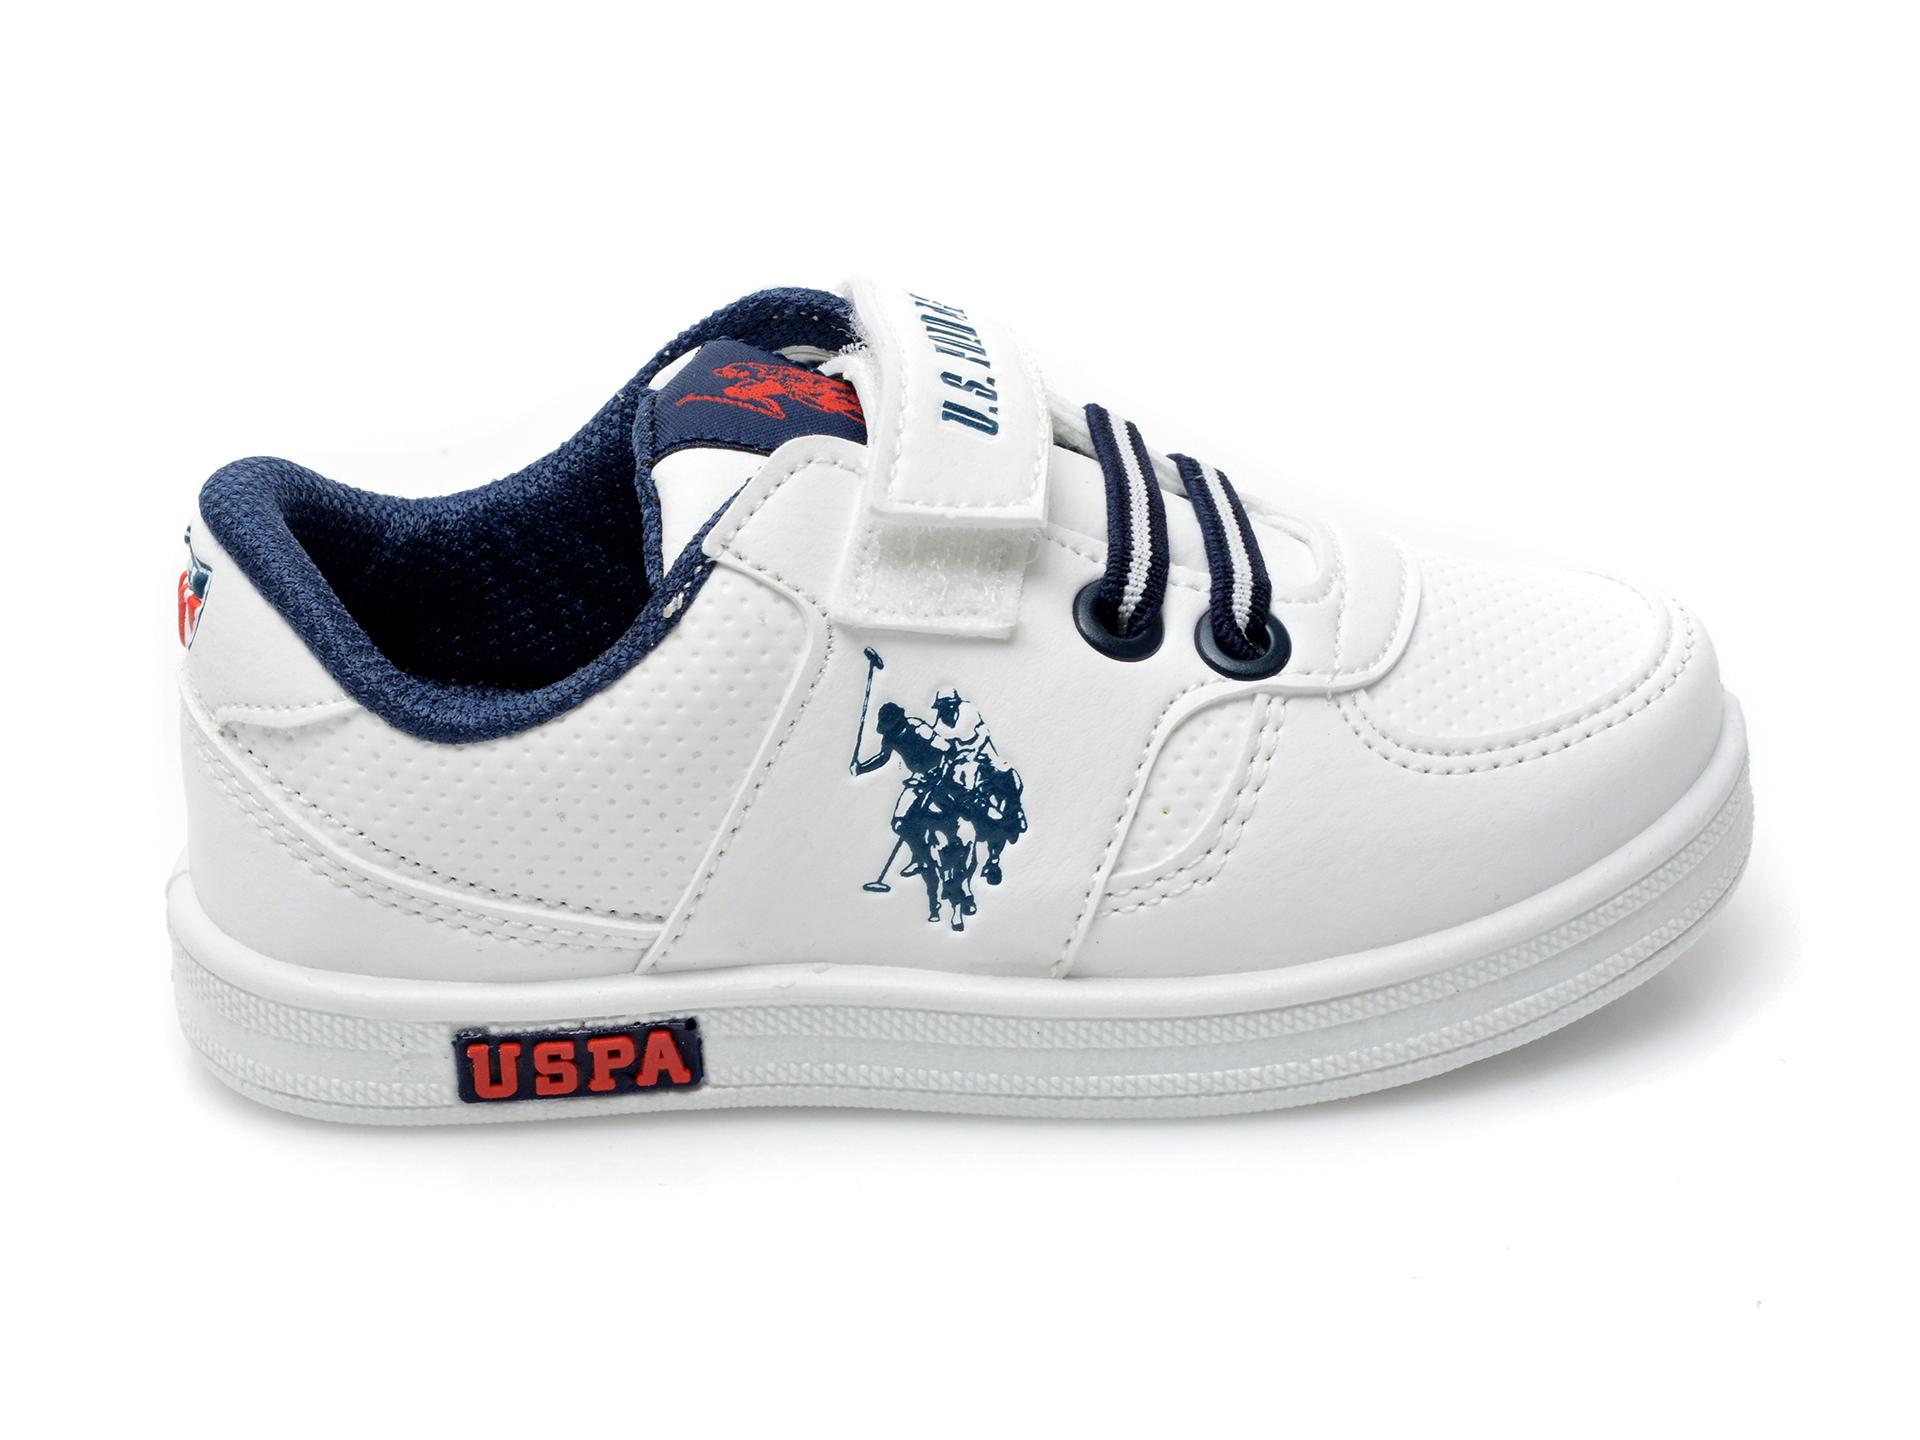 Pantofi sport US POLO ASSN albi, CAME1FX, din piele ecologica - 1